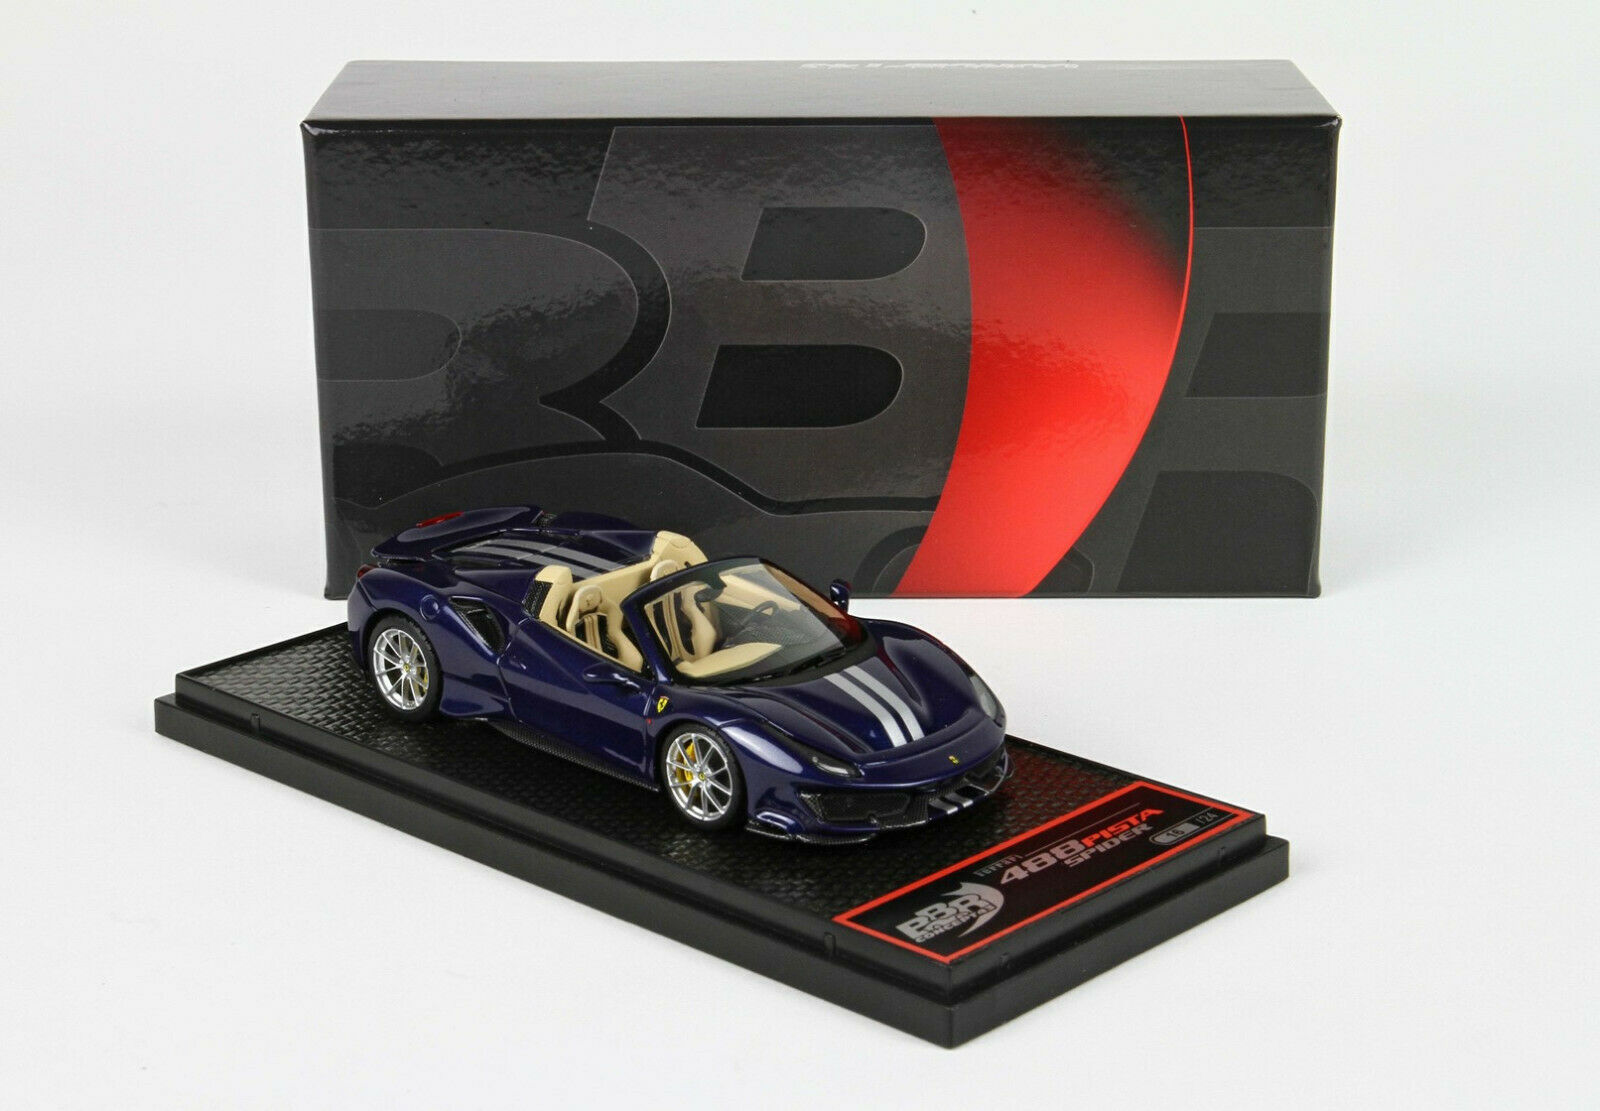 Ferrari 488 Pista Spider bleu  Swaters lim.ed. 24 pcs 1 43 BBRC218E1 BBR MODELS  réductions incroyables